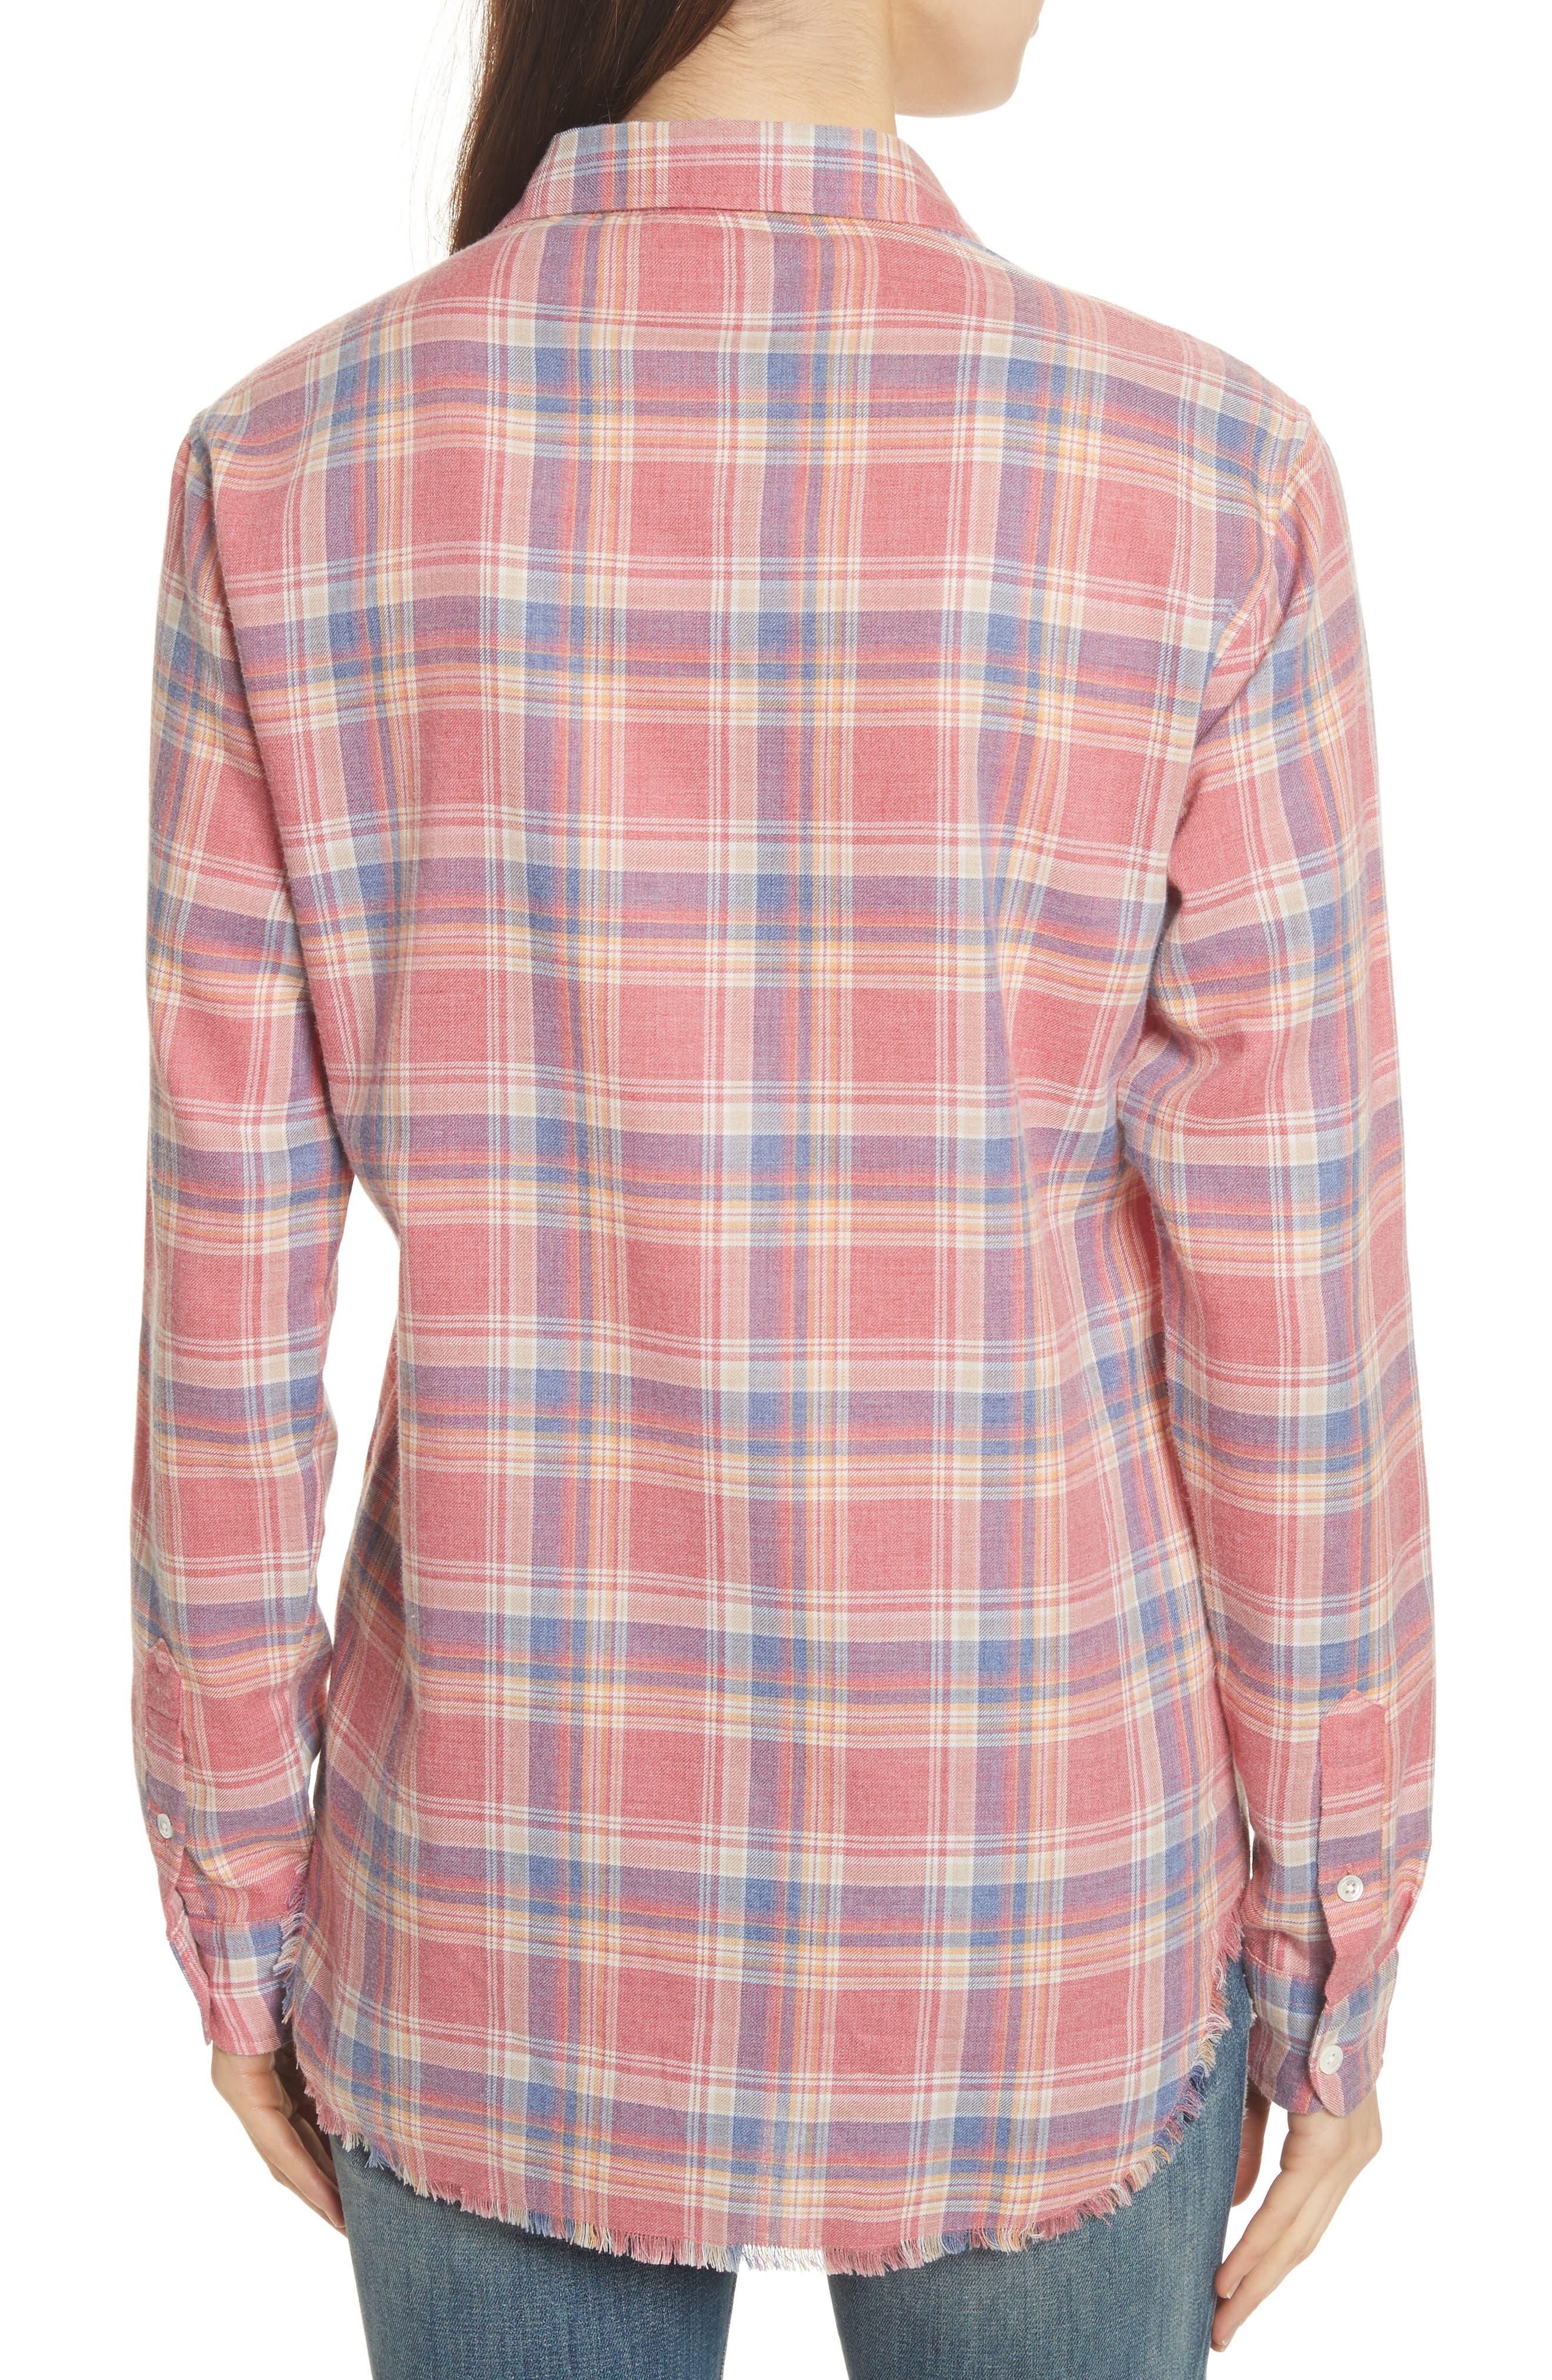 True Plaid Shirt,                             Alternate thumbnail 2, color,                             601